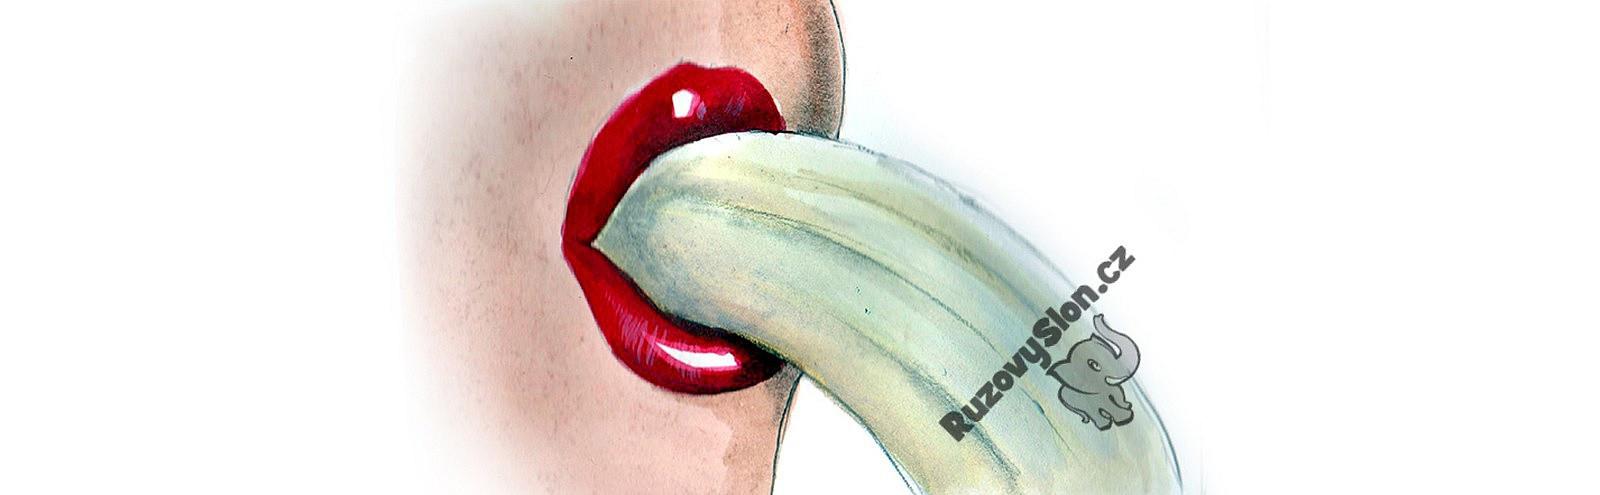 ženská ústa s banánem